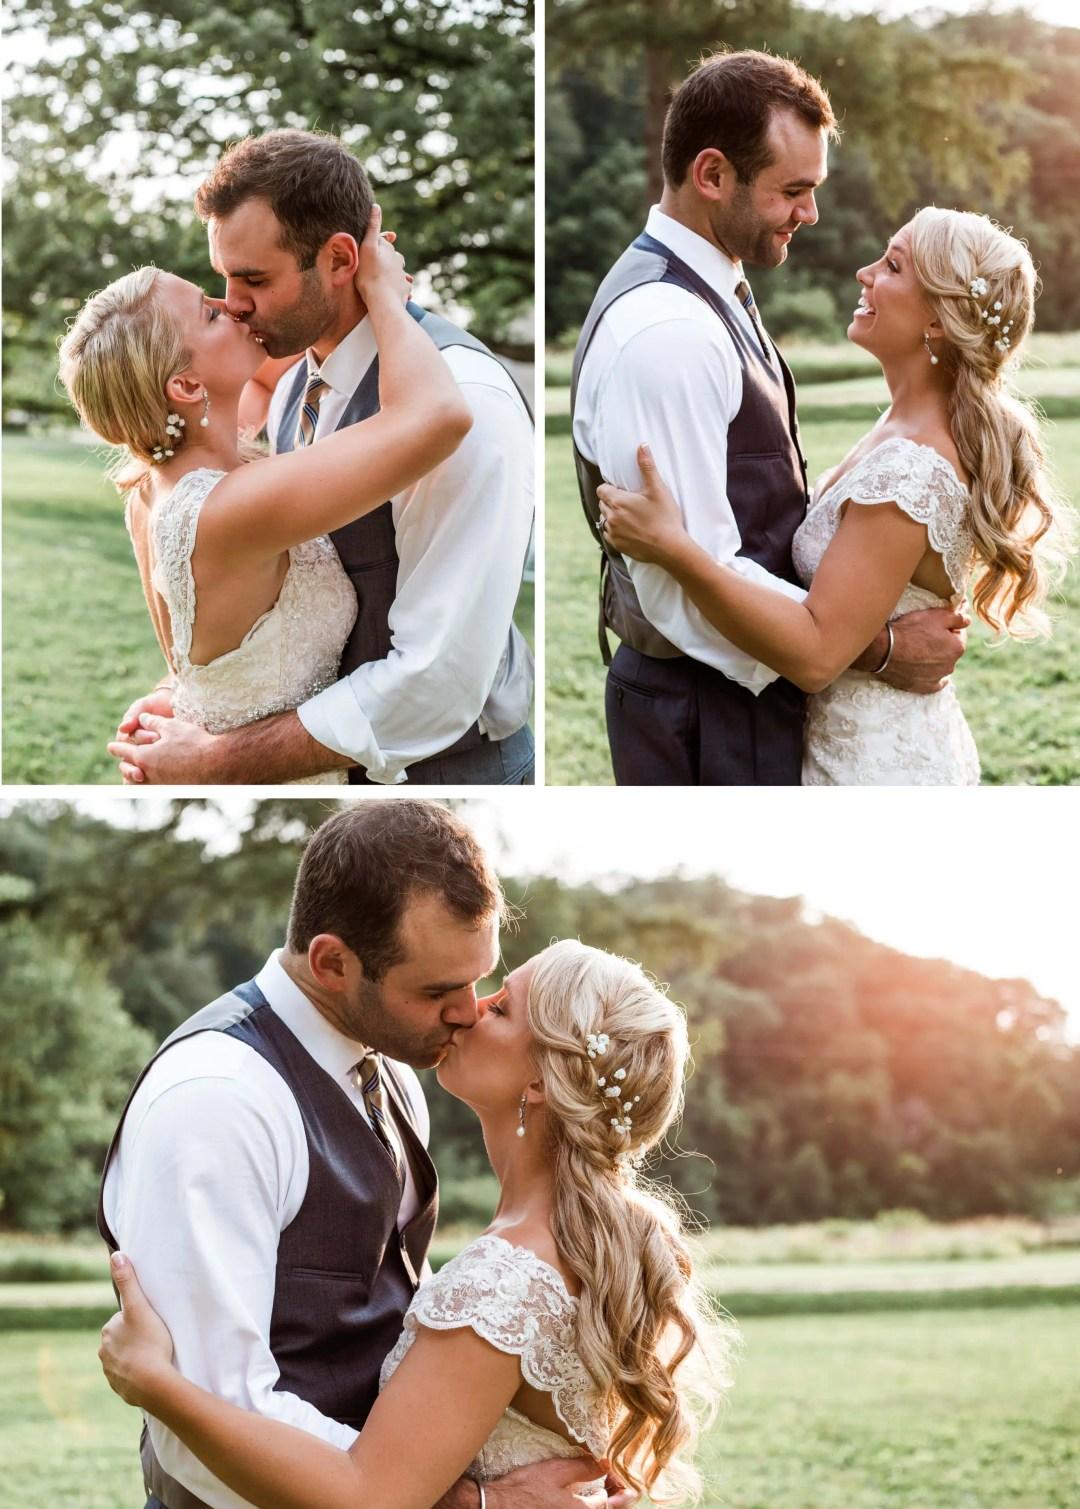 Sussex Wedding Photographer - Romantic couple portraits